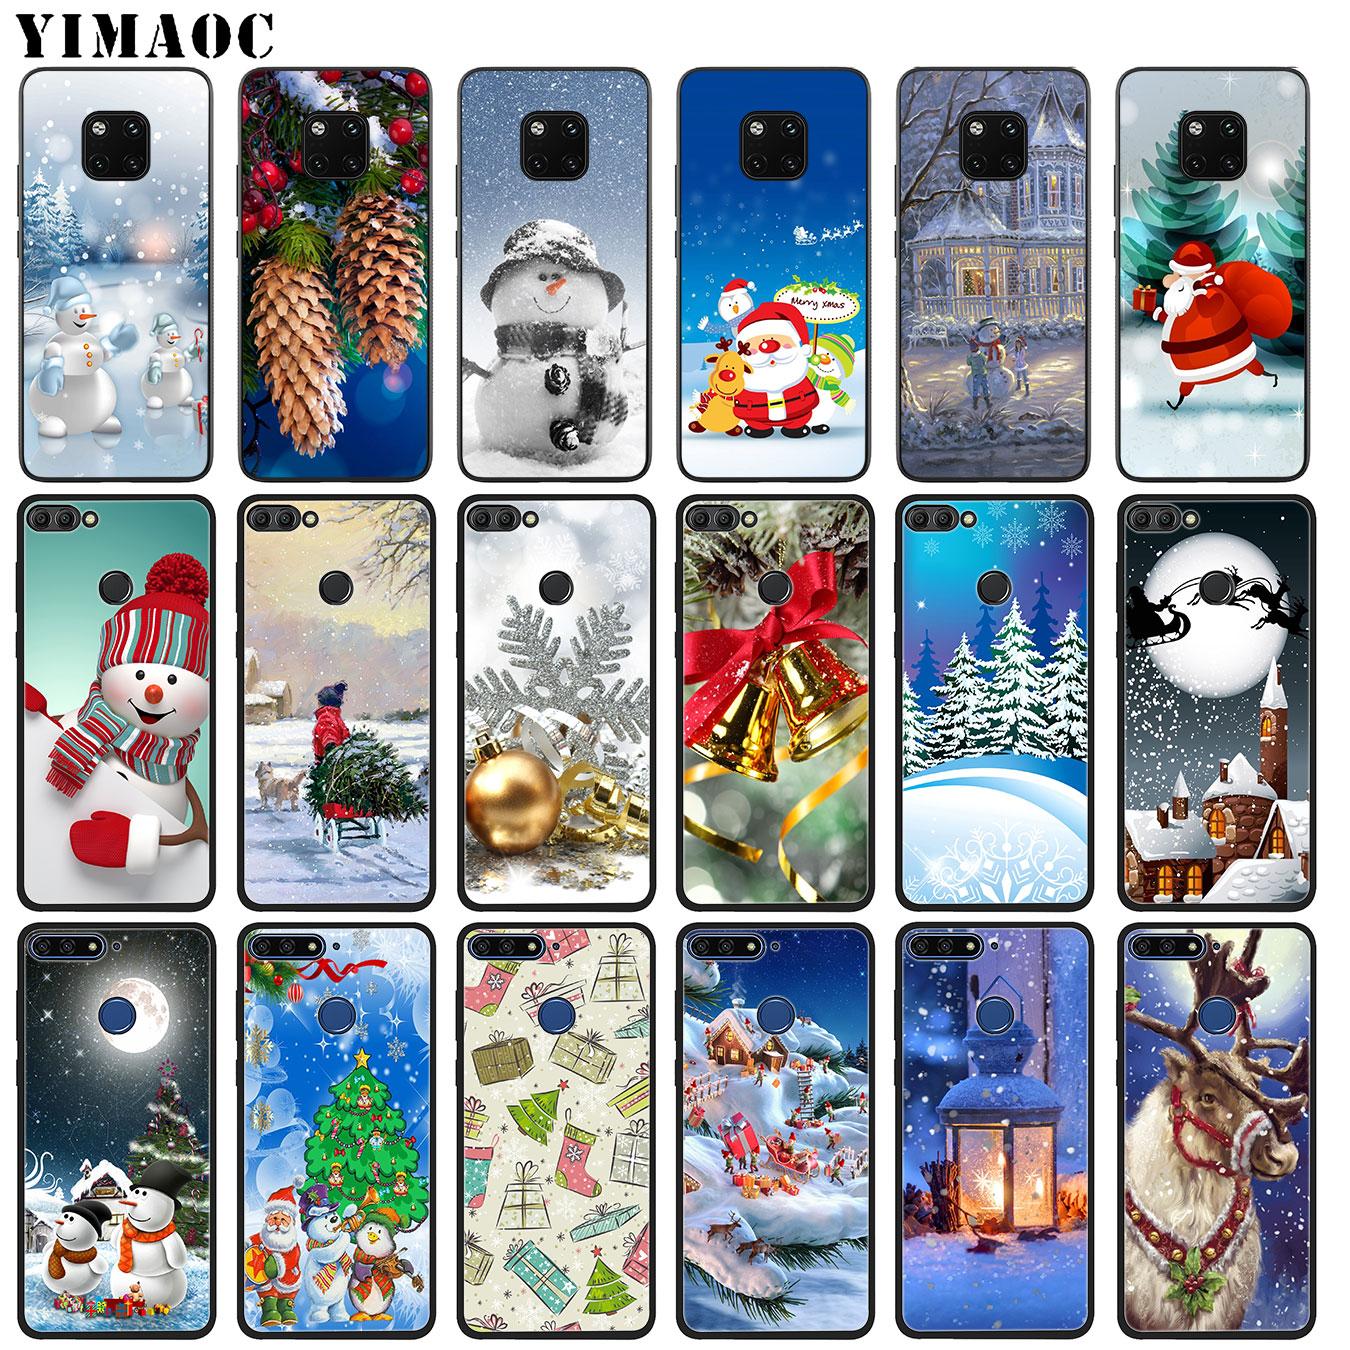 YIMAOC Рождество Снеговик Снег Санта Клаус Мягкие силиконовые чехол для телефона для huawei Nova 3 3i 2i Примечание коврики 20 10 Pro Lite